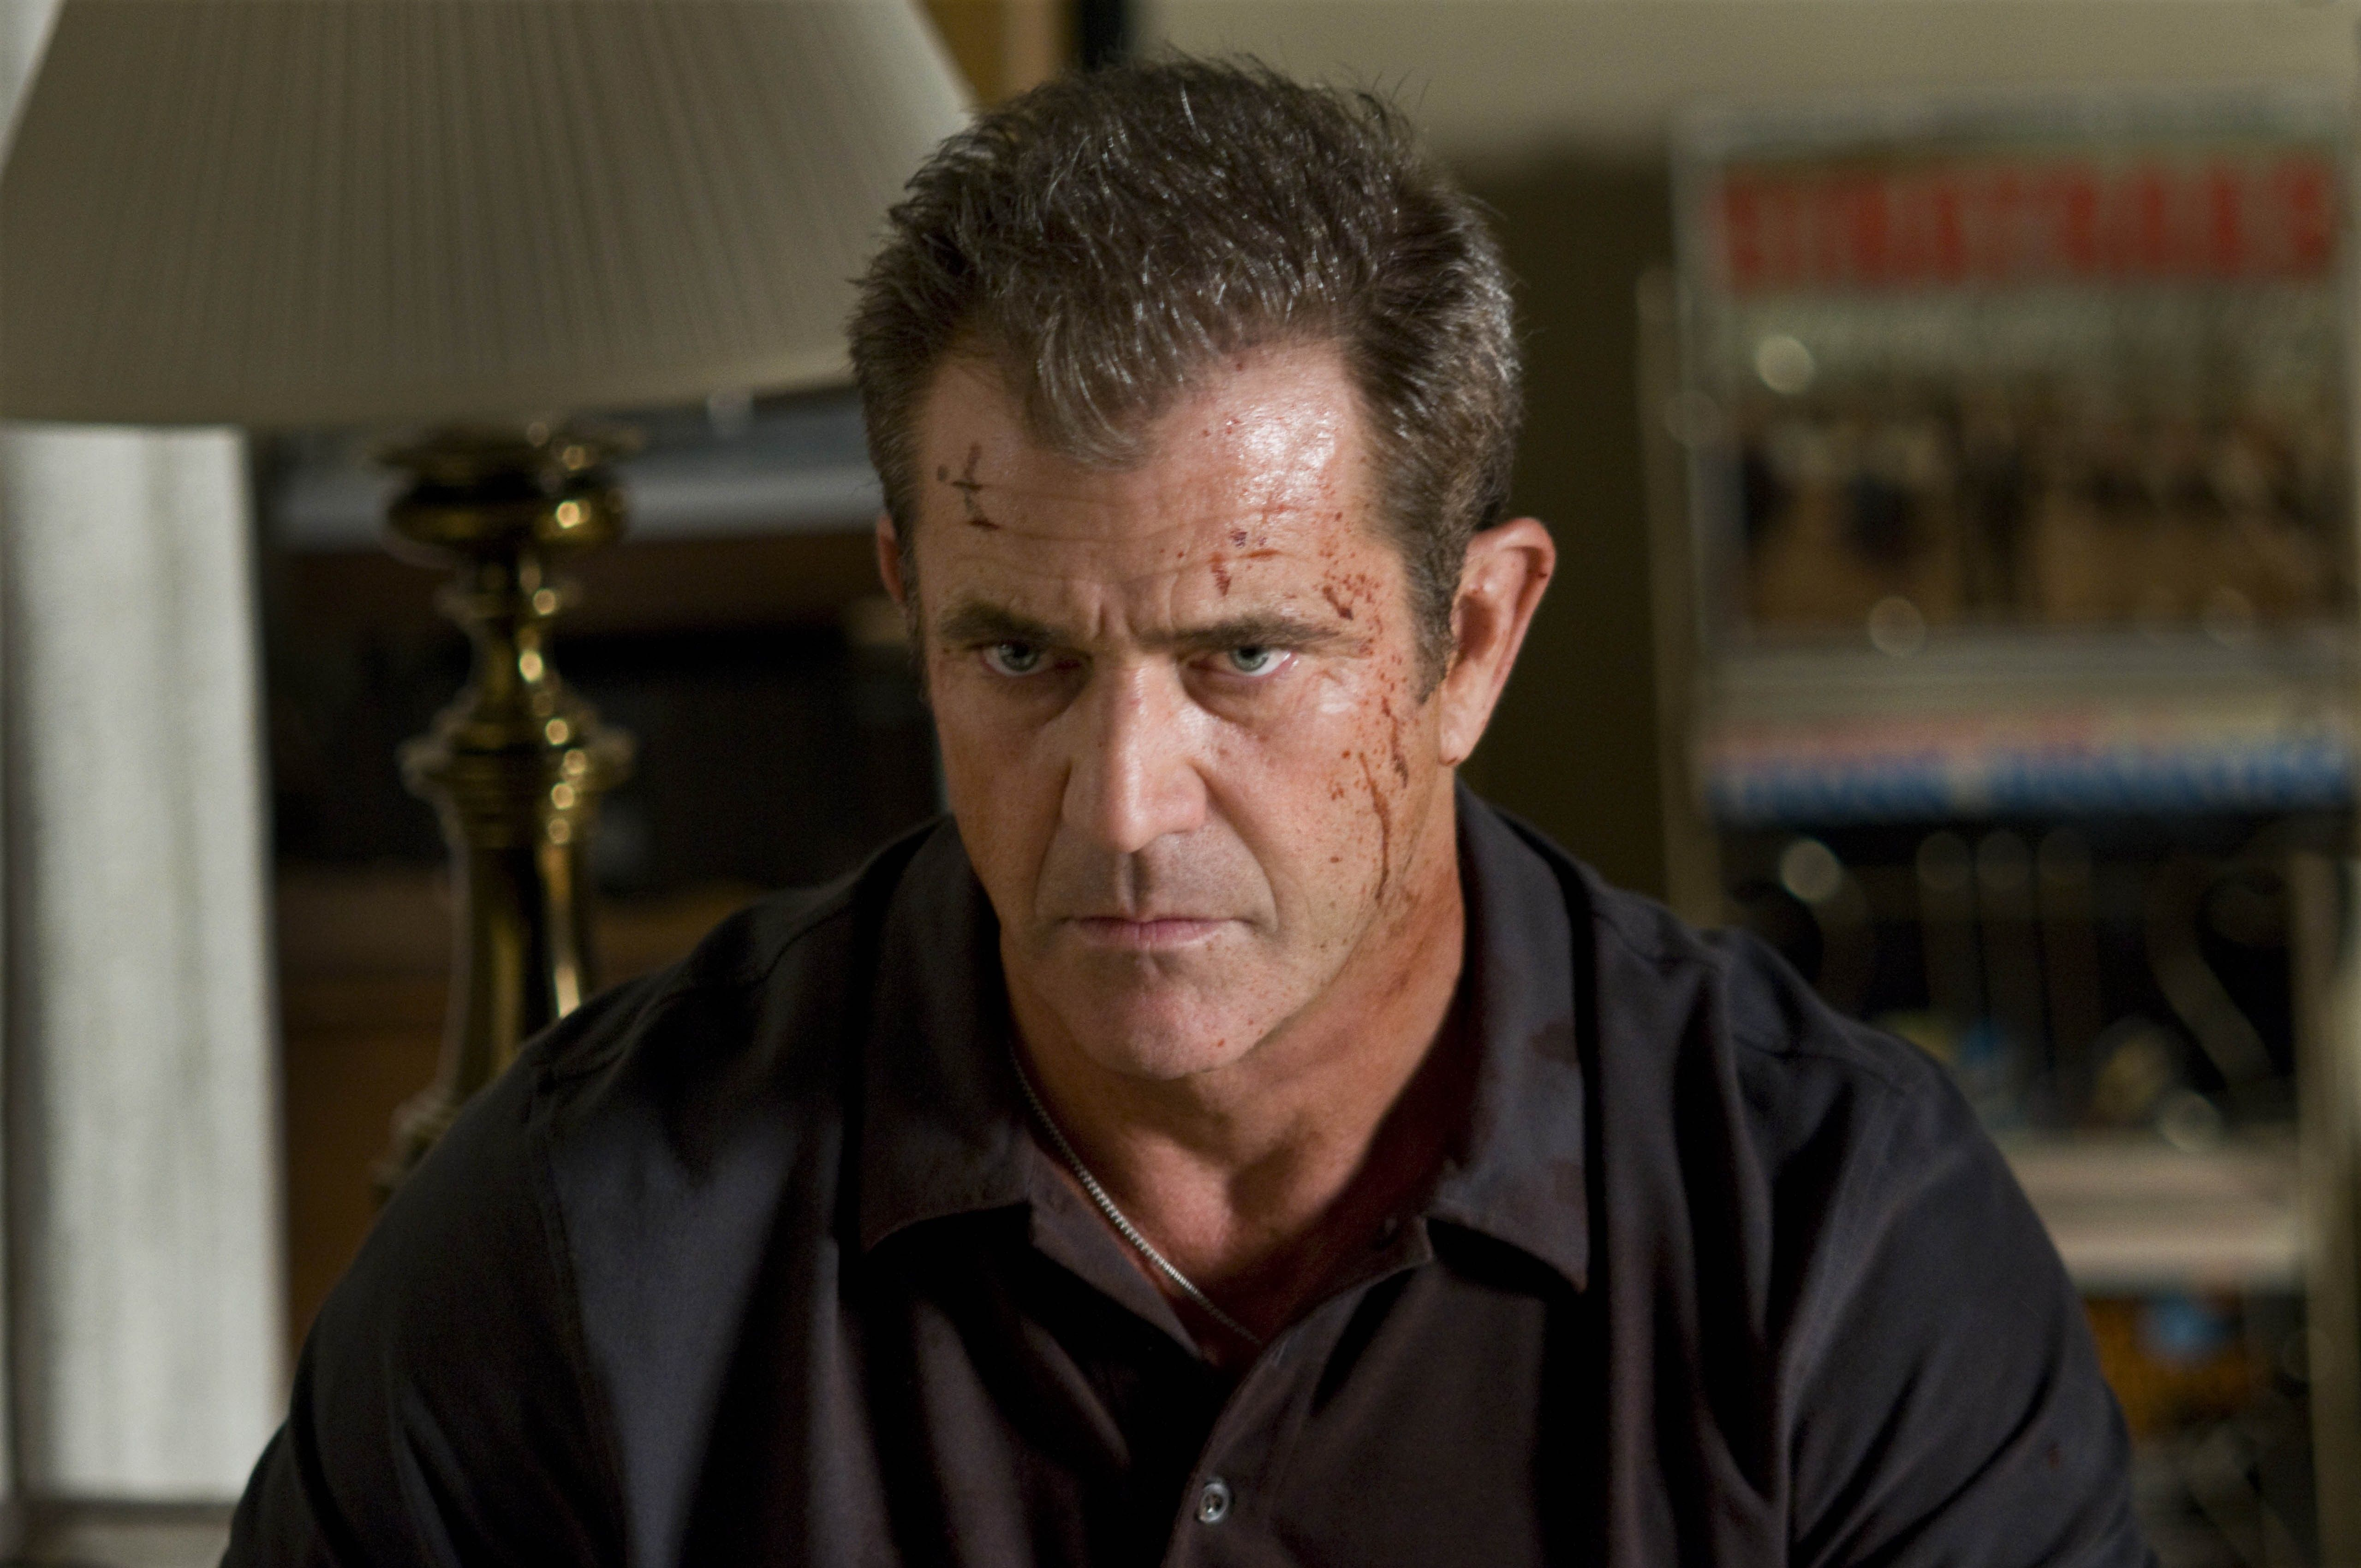 Pin Von Maria Theresia Auf Mel Gibson The Expendables Sylvester Stallone The Villain